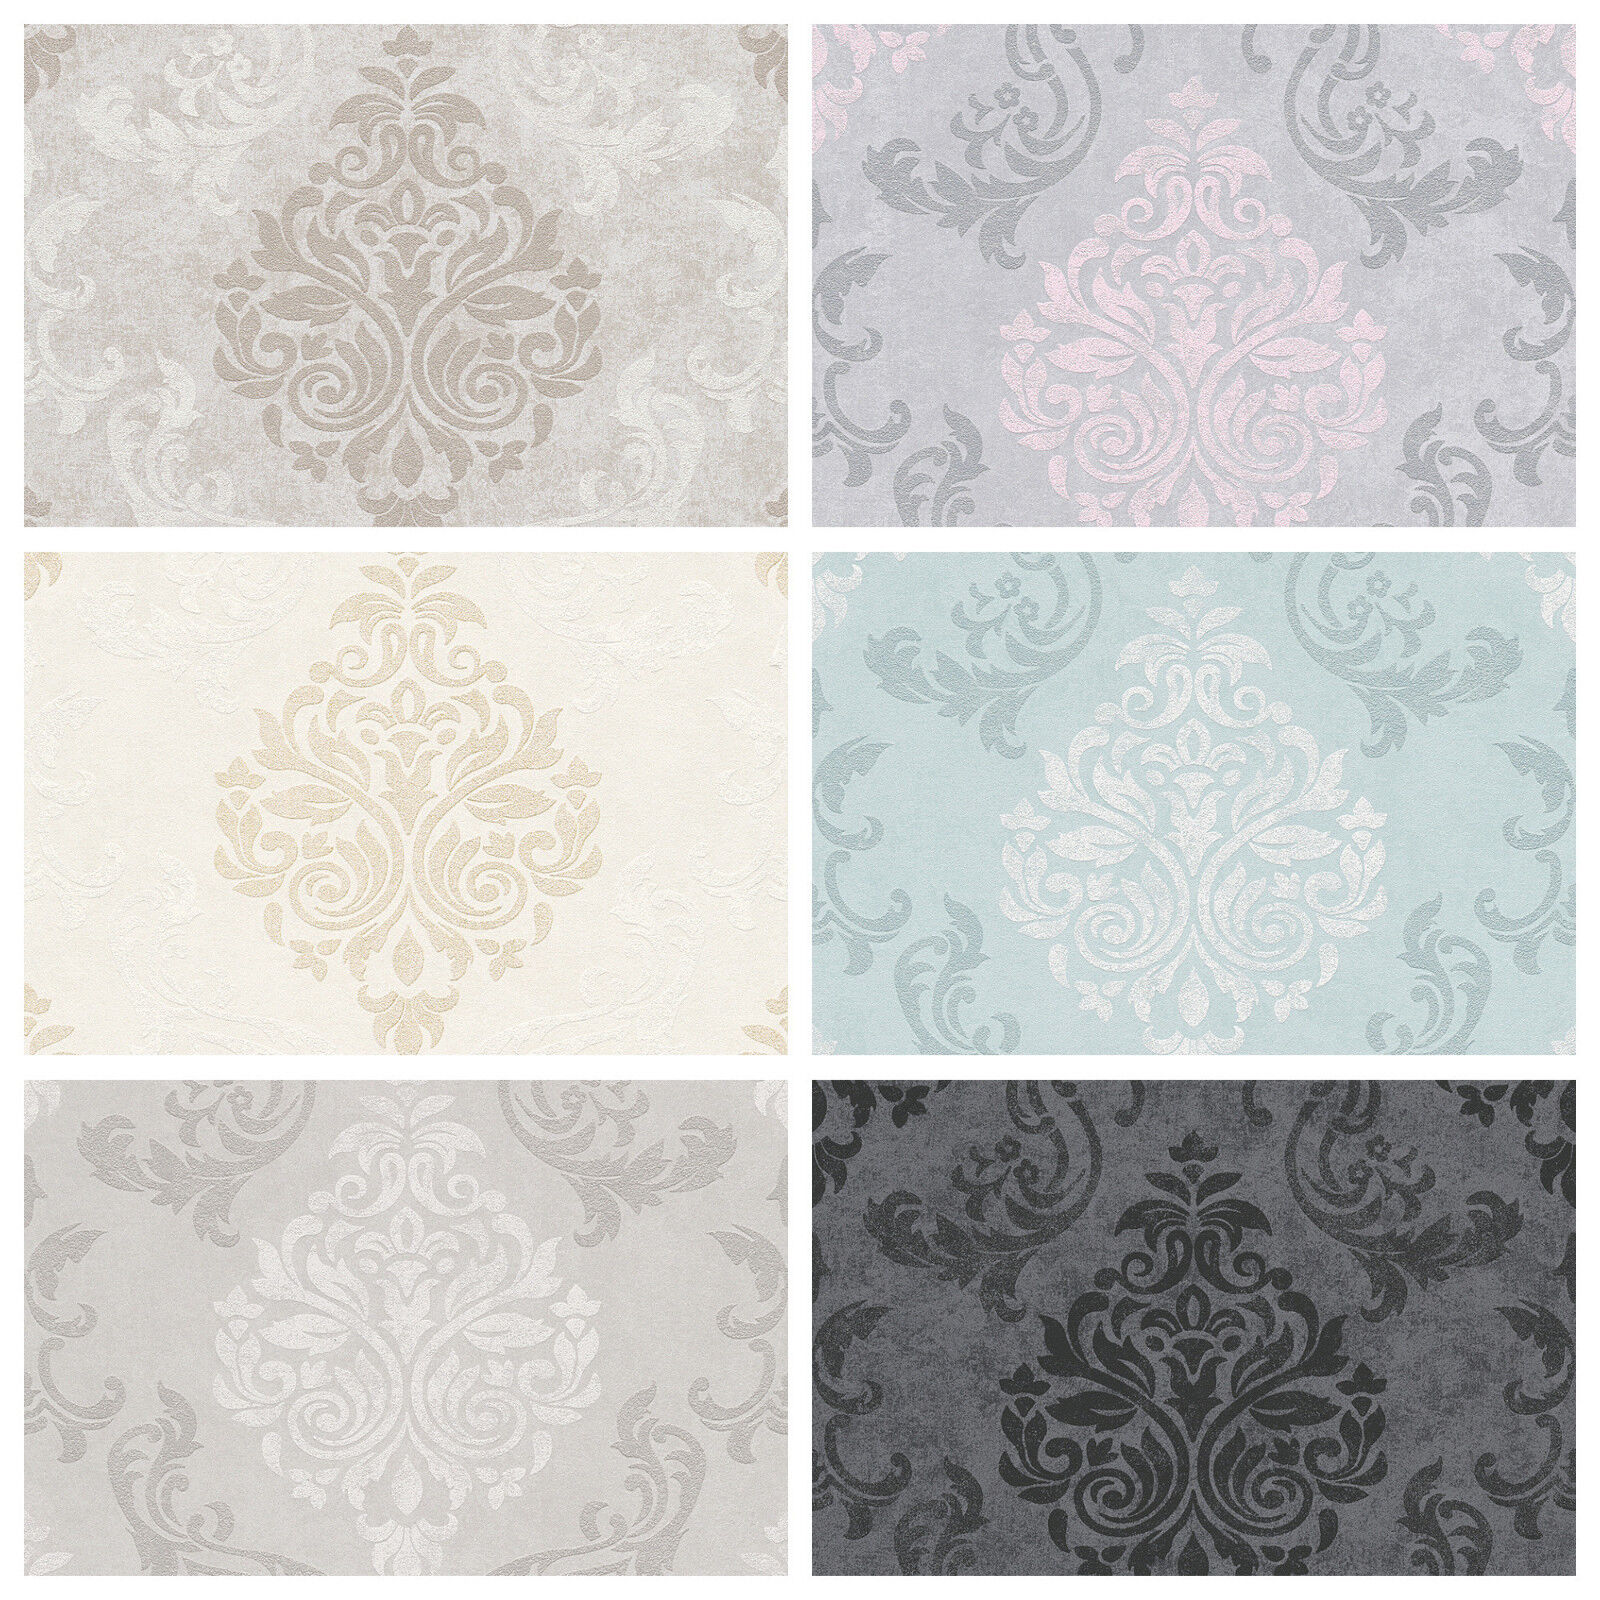 Vlies Tapete Barock Muster Ornament Glitzer Anthrazit Rosa Grau Beige Mint Ebay